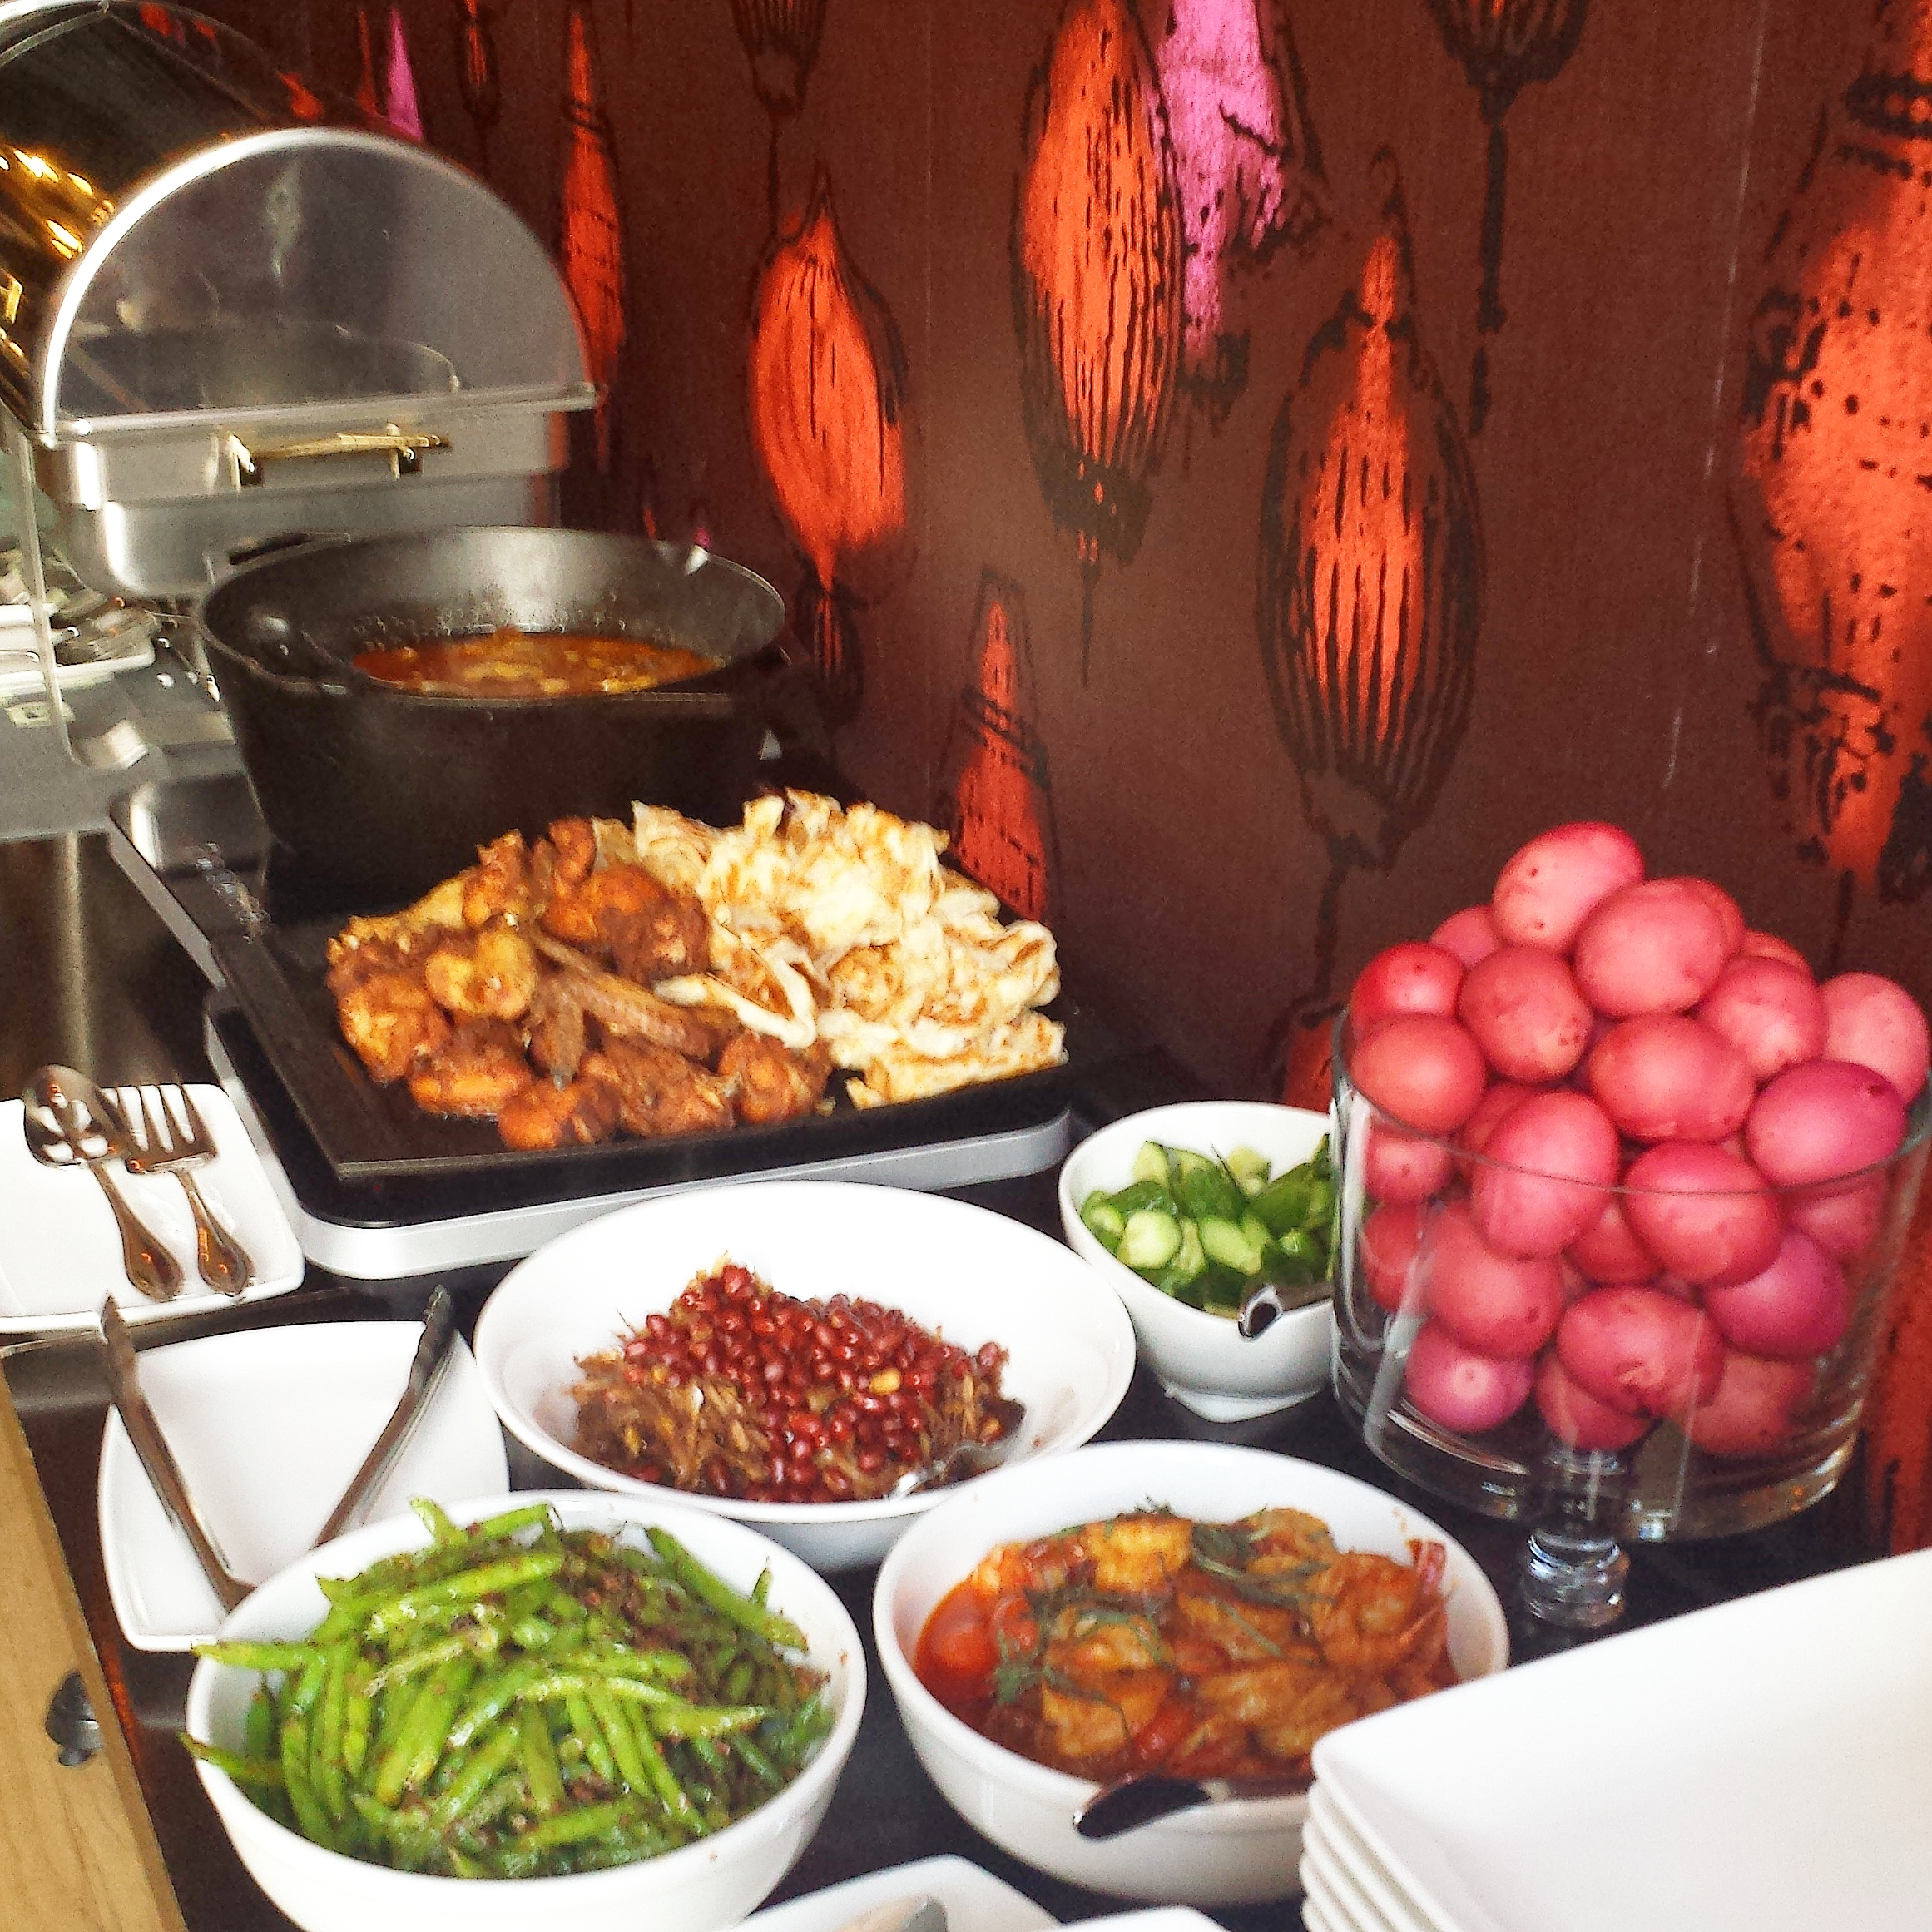 Brunch Party Buffet   Traditional Malay style brunch - rendang beef short ribs, sambal ikan bilis, tamarind prawns, rempah fried chicken, wok tossed mee, green bean sambal, nasi kunyit, coconut rice, roti, red eggs.